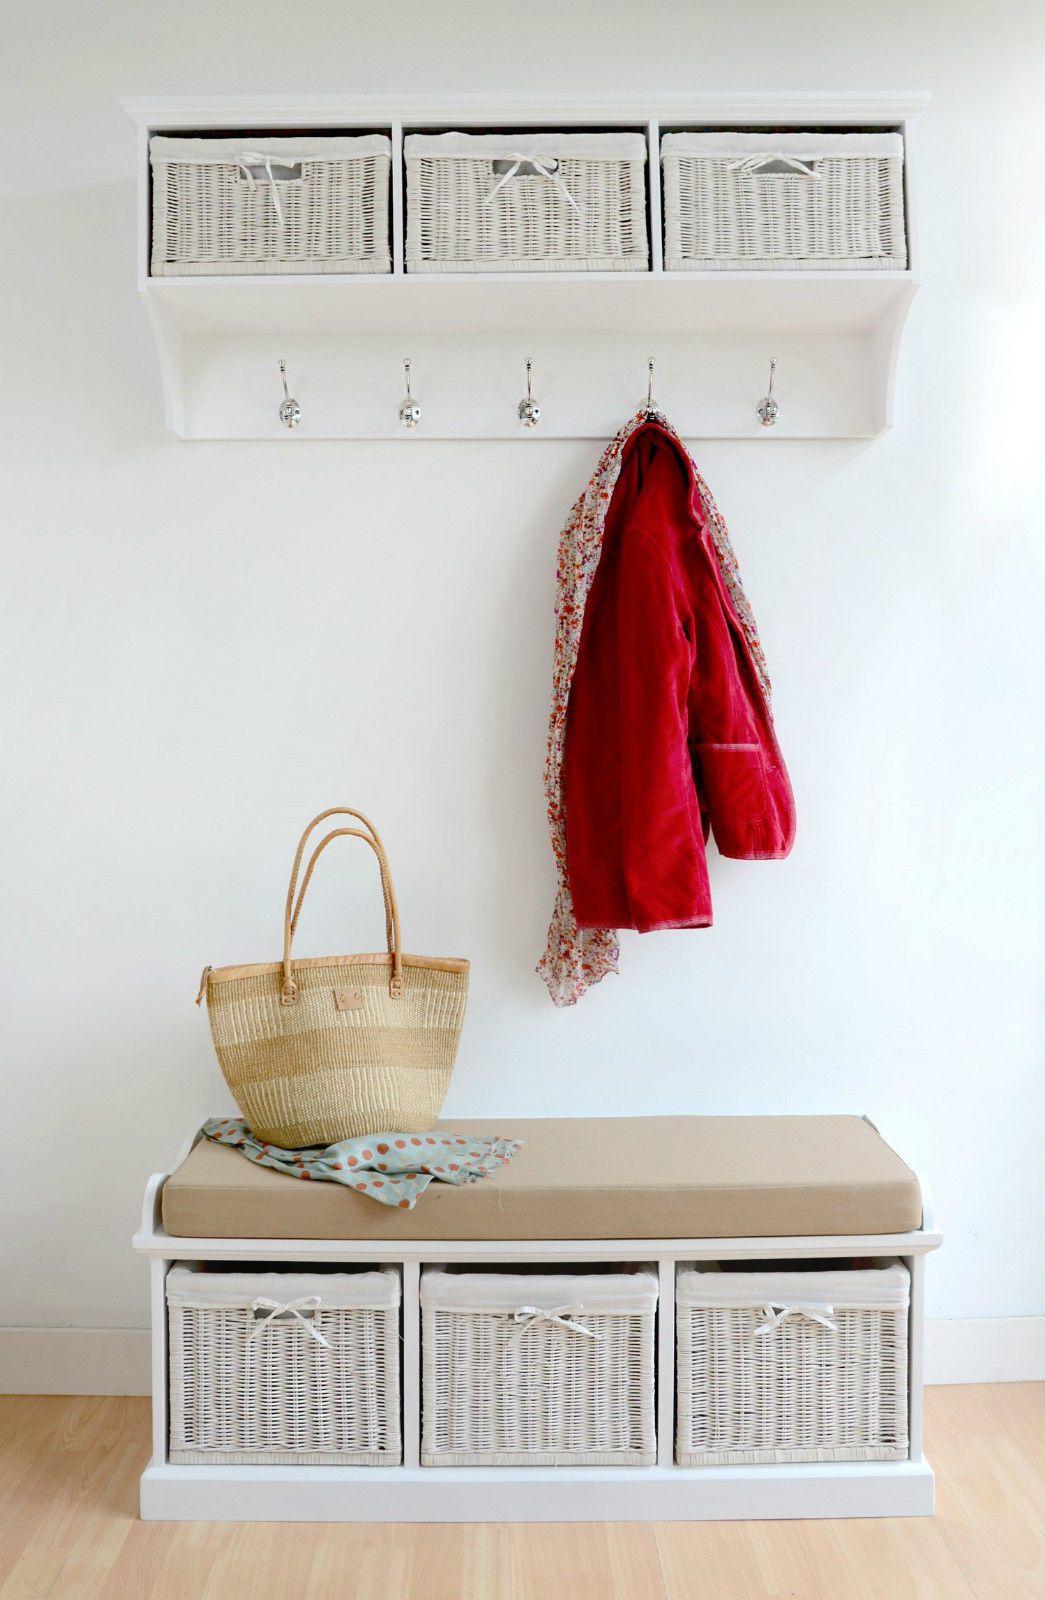 Merveilleux Tetbury Hallway Bench, White Hallway Storage Bench With Cushion, Hanging  Shelf